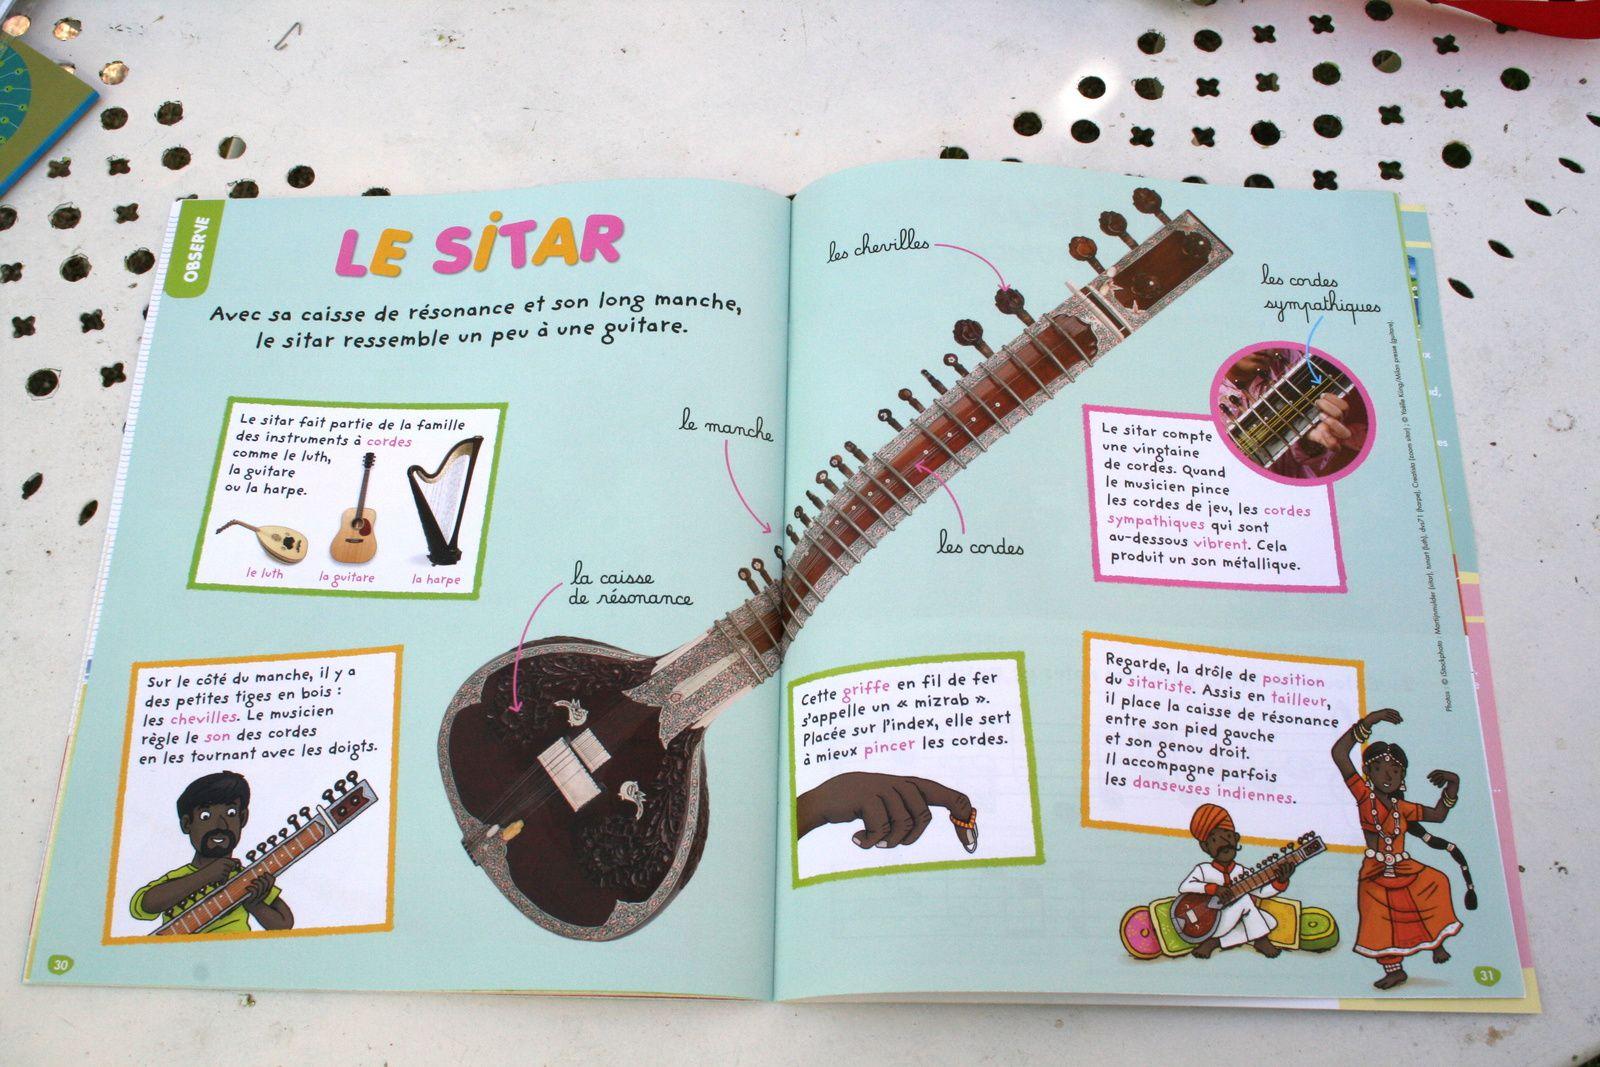 "#toupie ""magazine #enfant #musique #chanson #charlotteblabla blog"